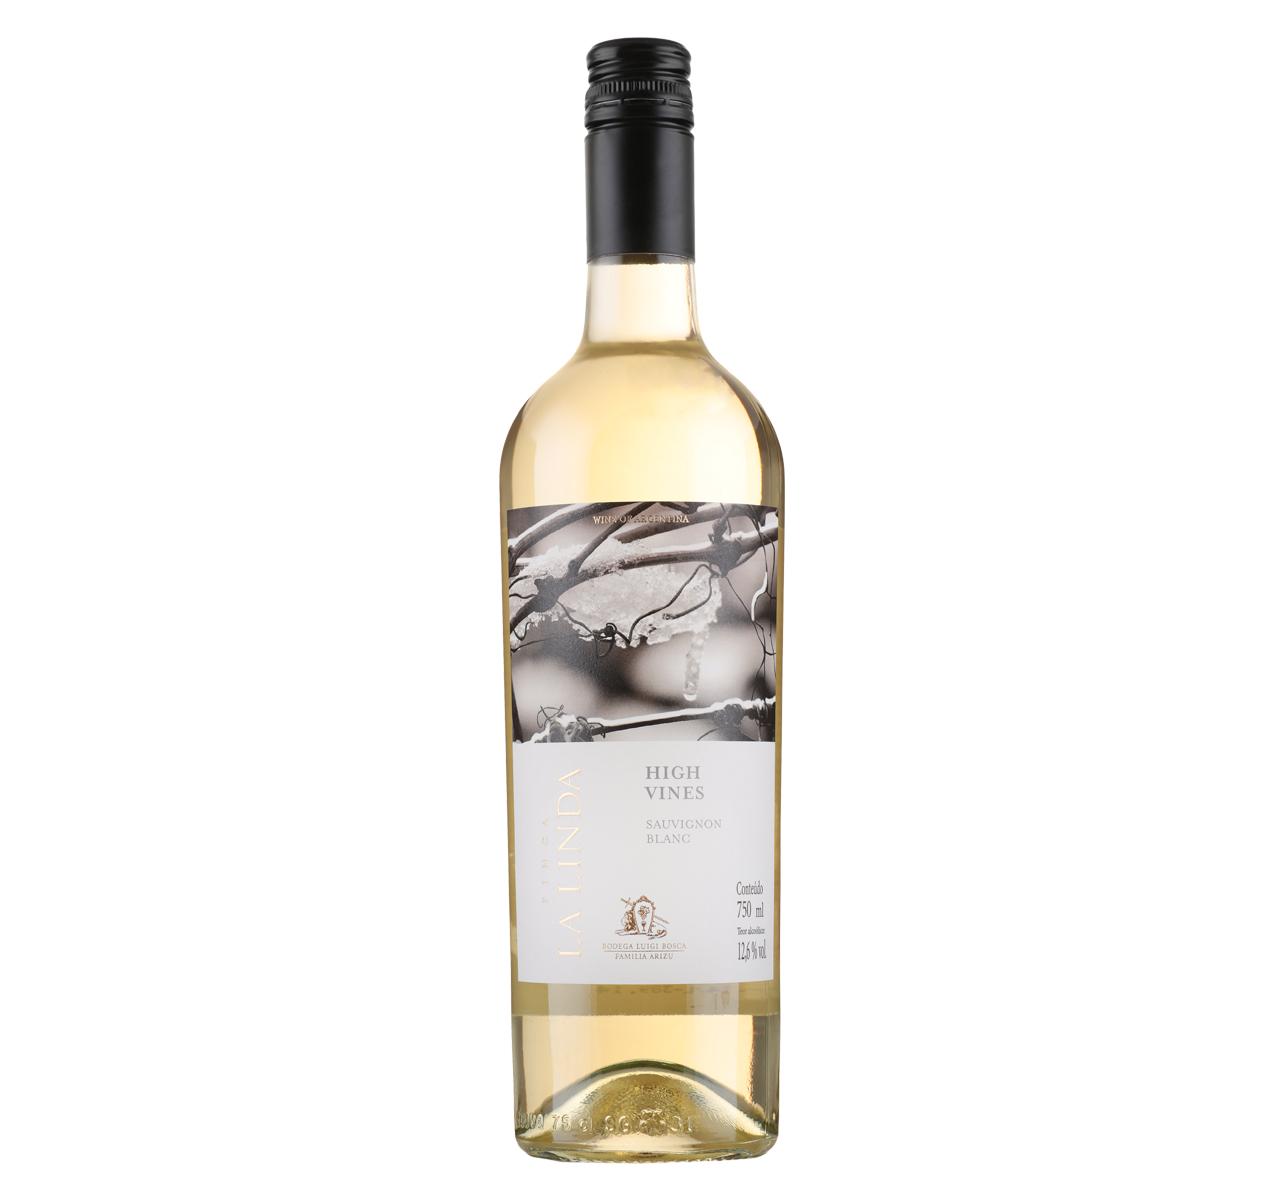 Finca La Linda High Vines Sauvignon Blanc